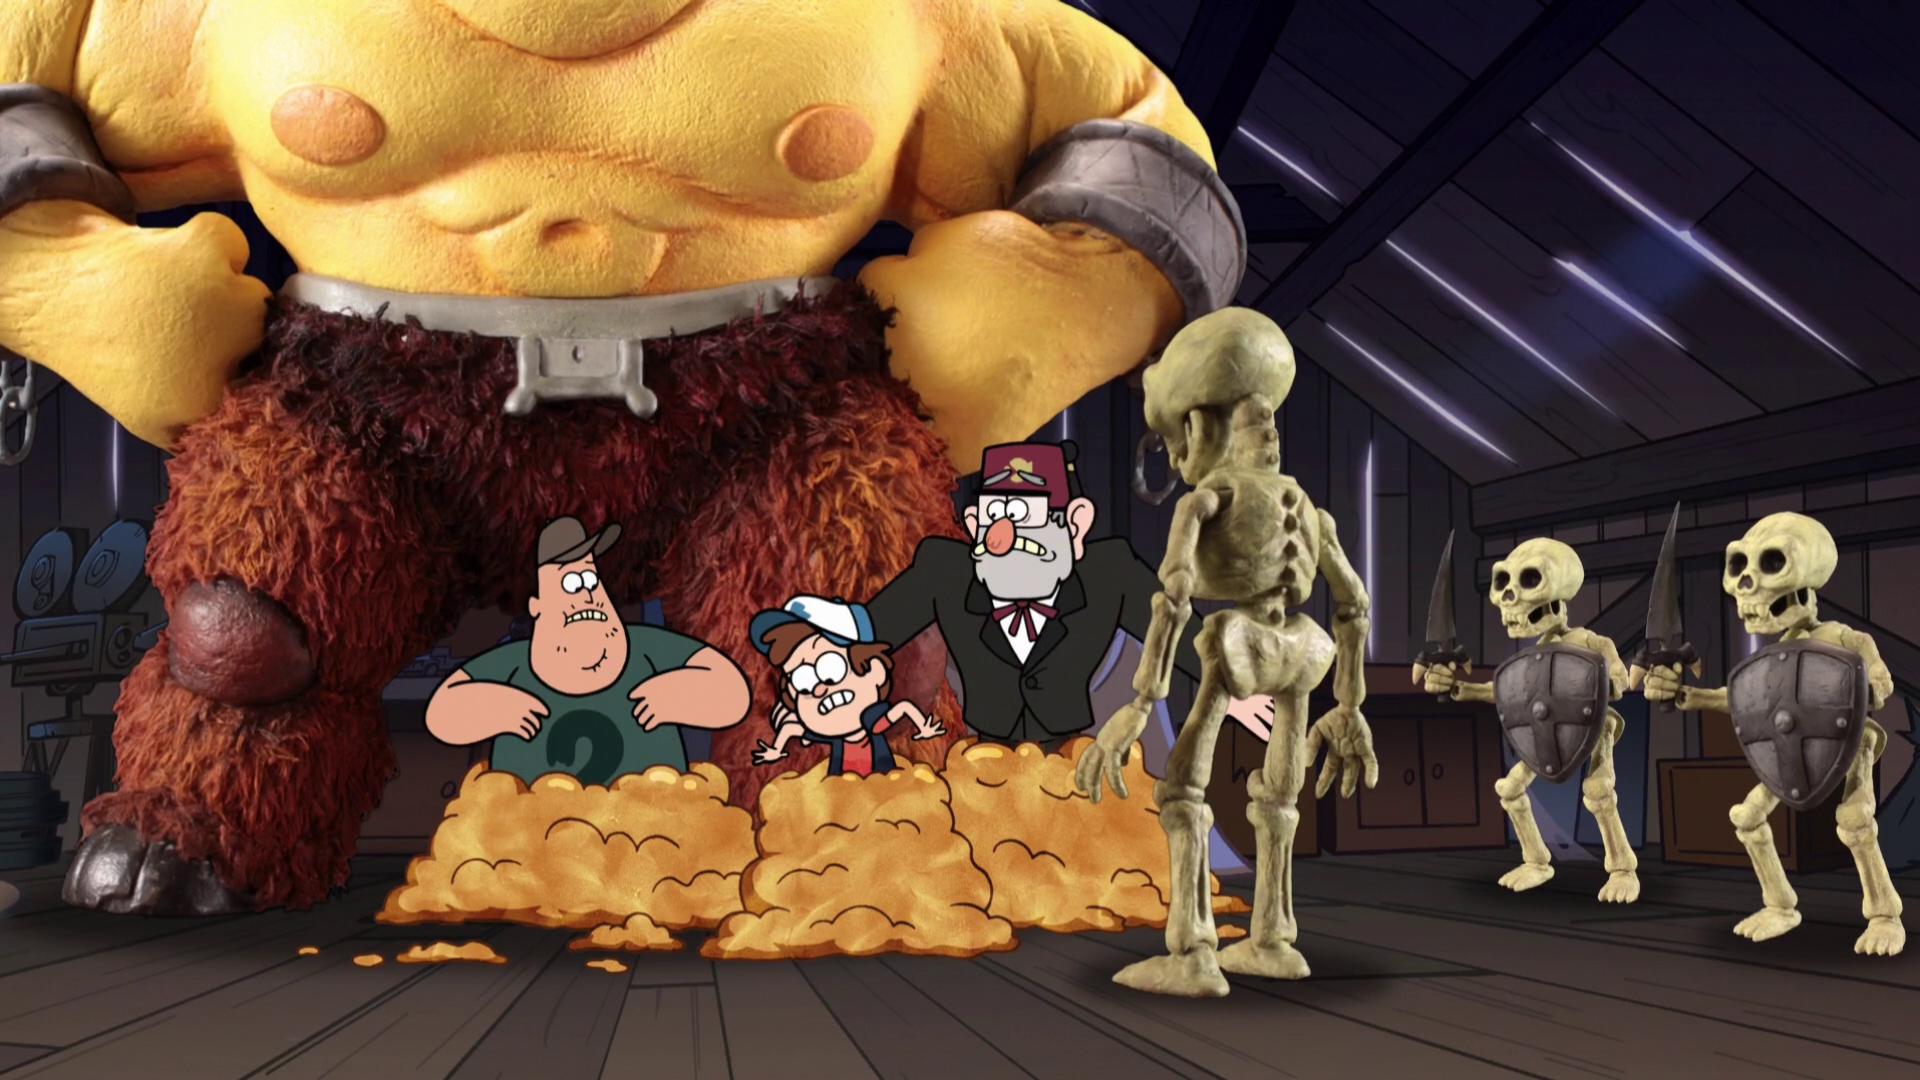 Gravity Falls Mabel Pines Pet Tentacle Monster Waddles